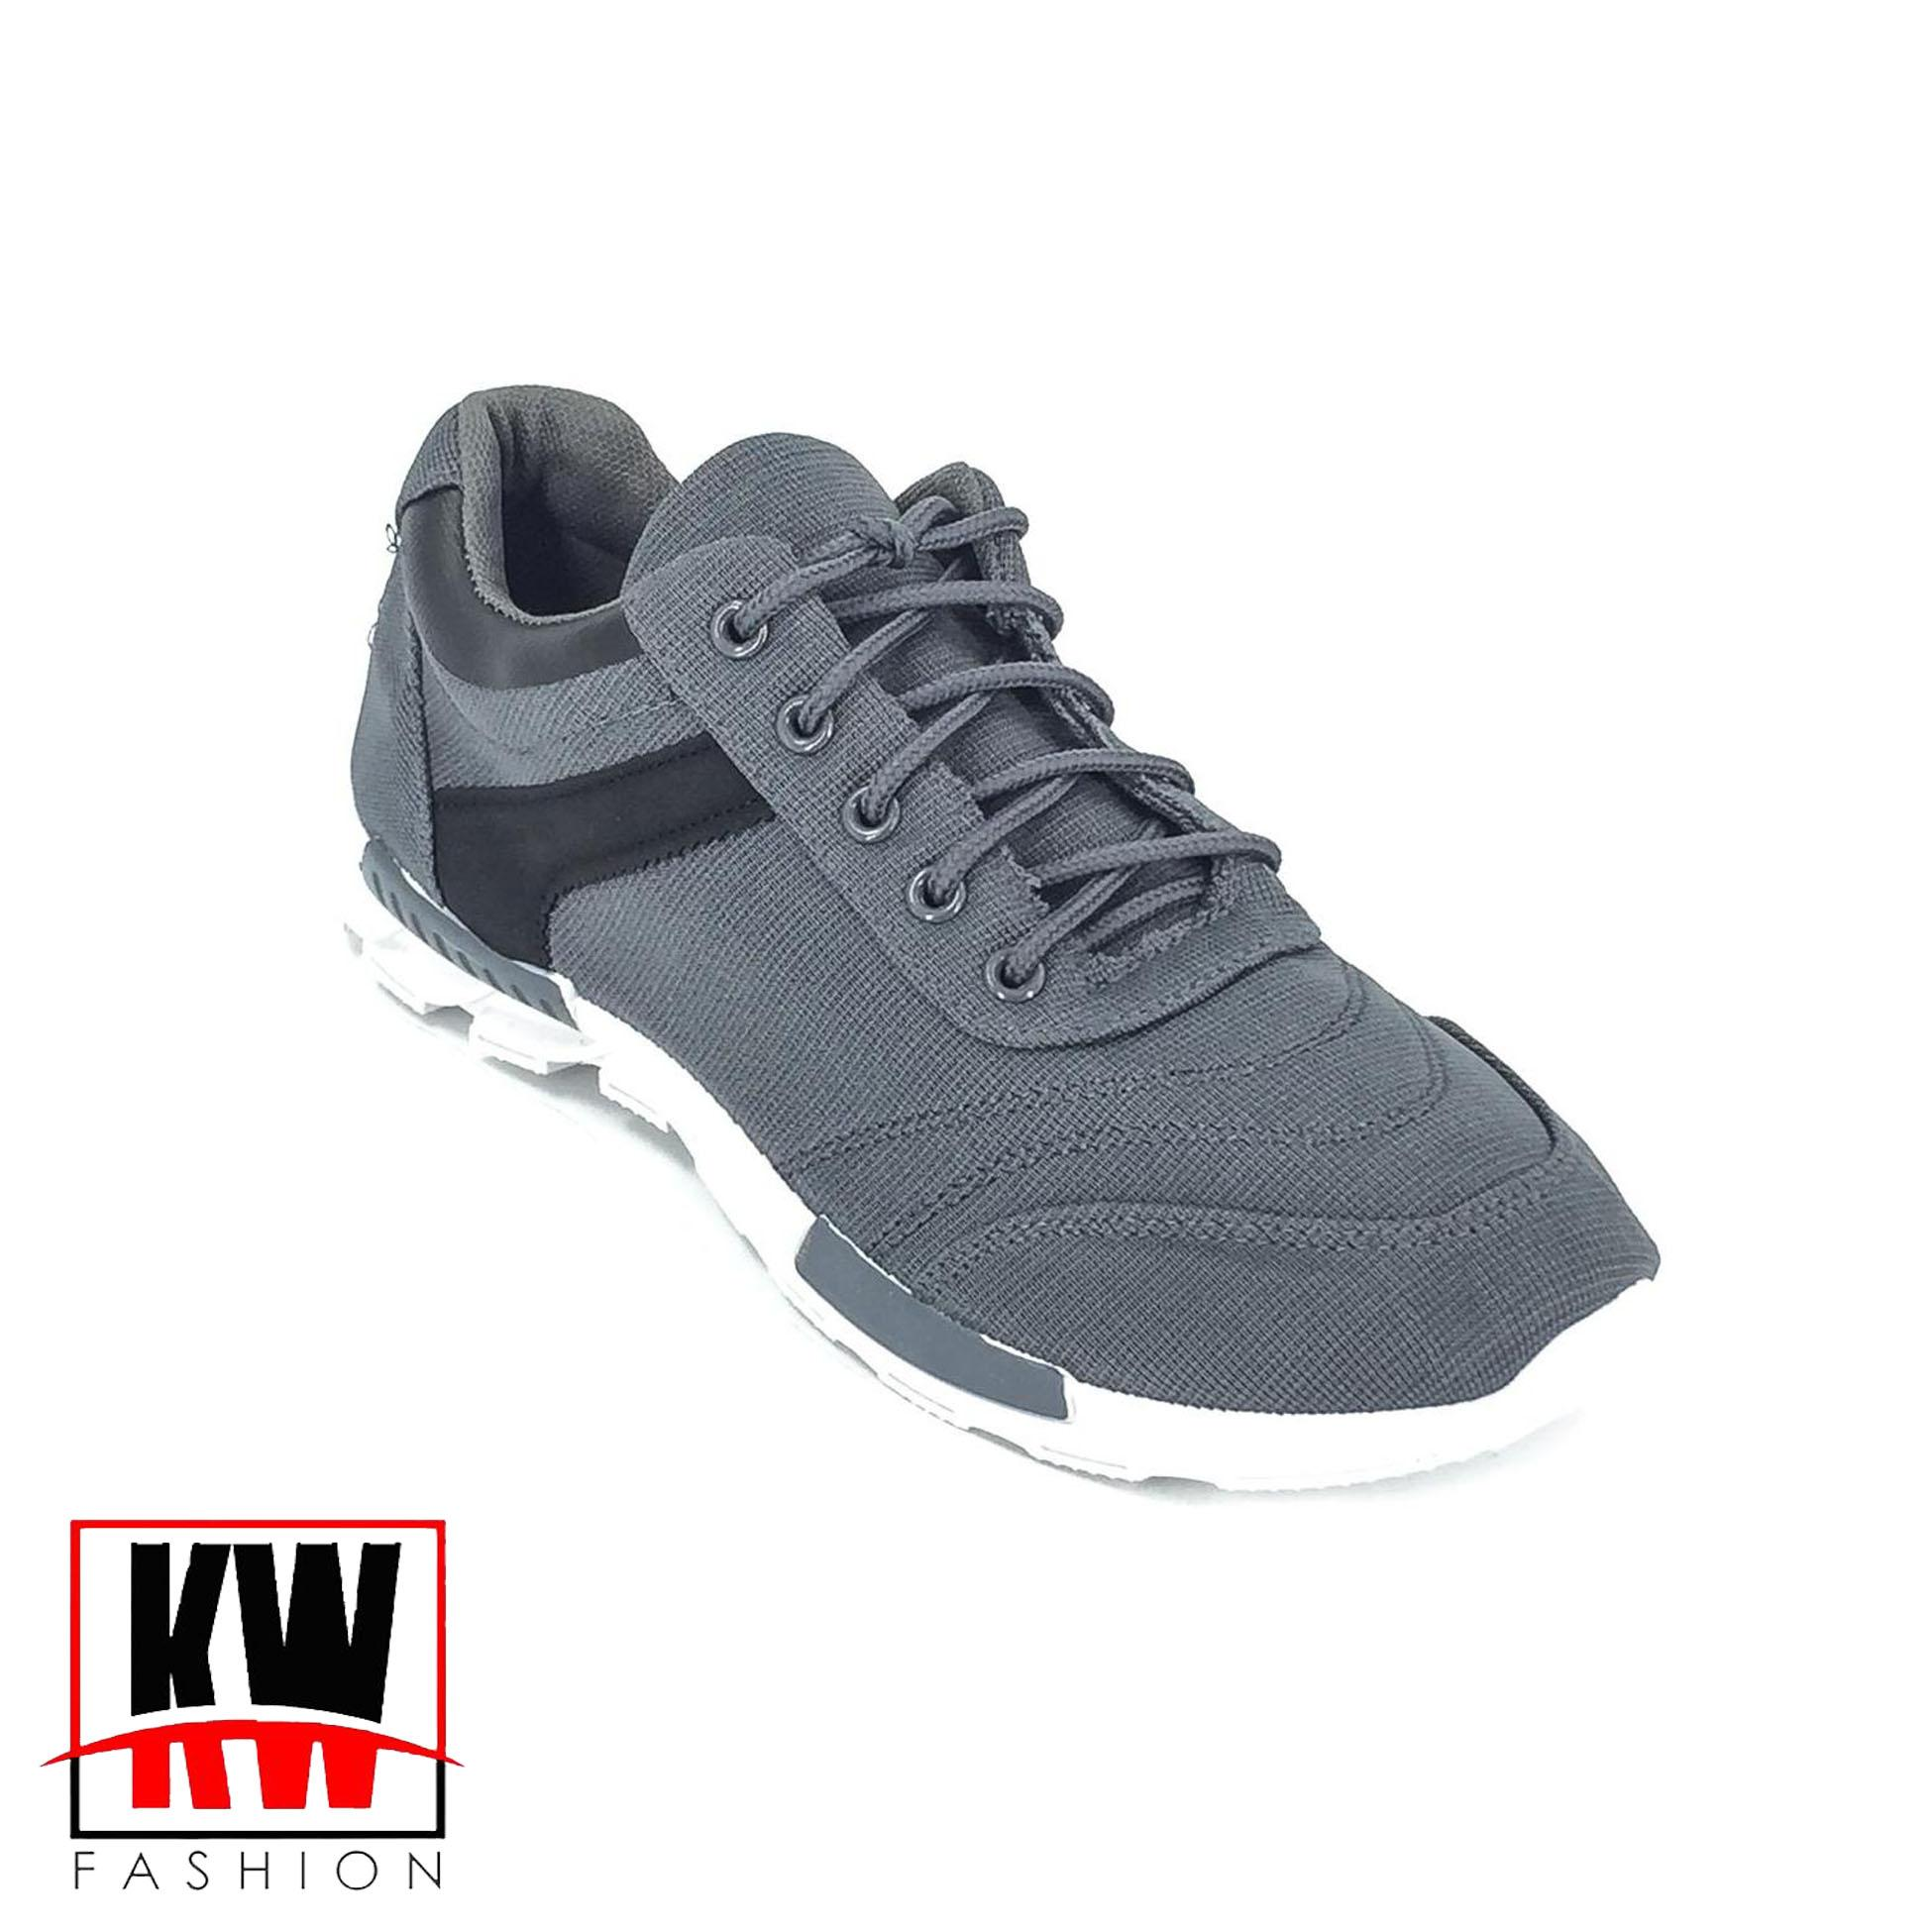 822b88813 Shoes for Men for sale - Mens Fashion Shoes online brands